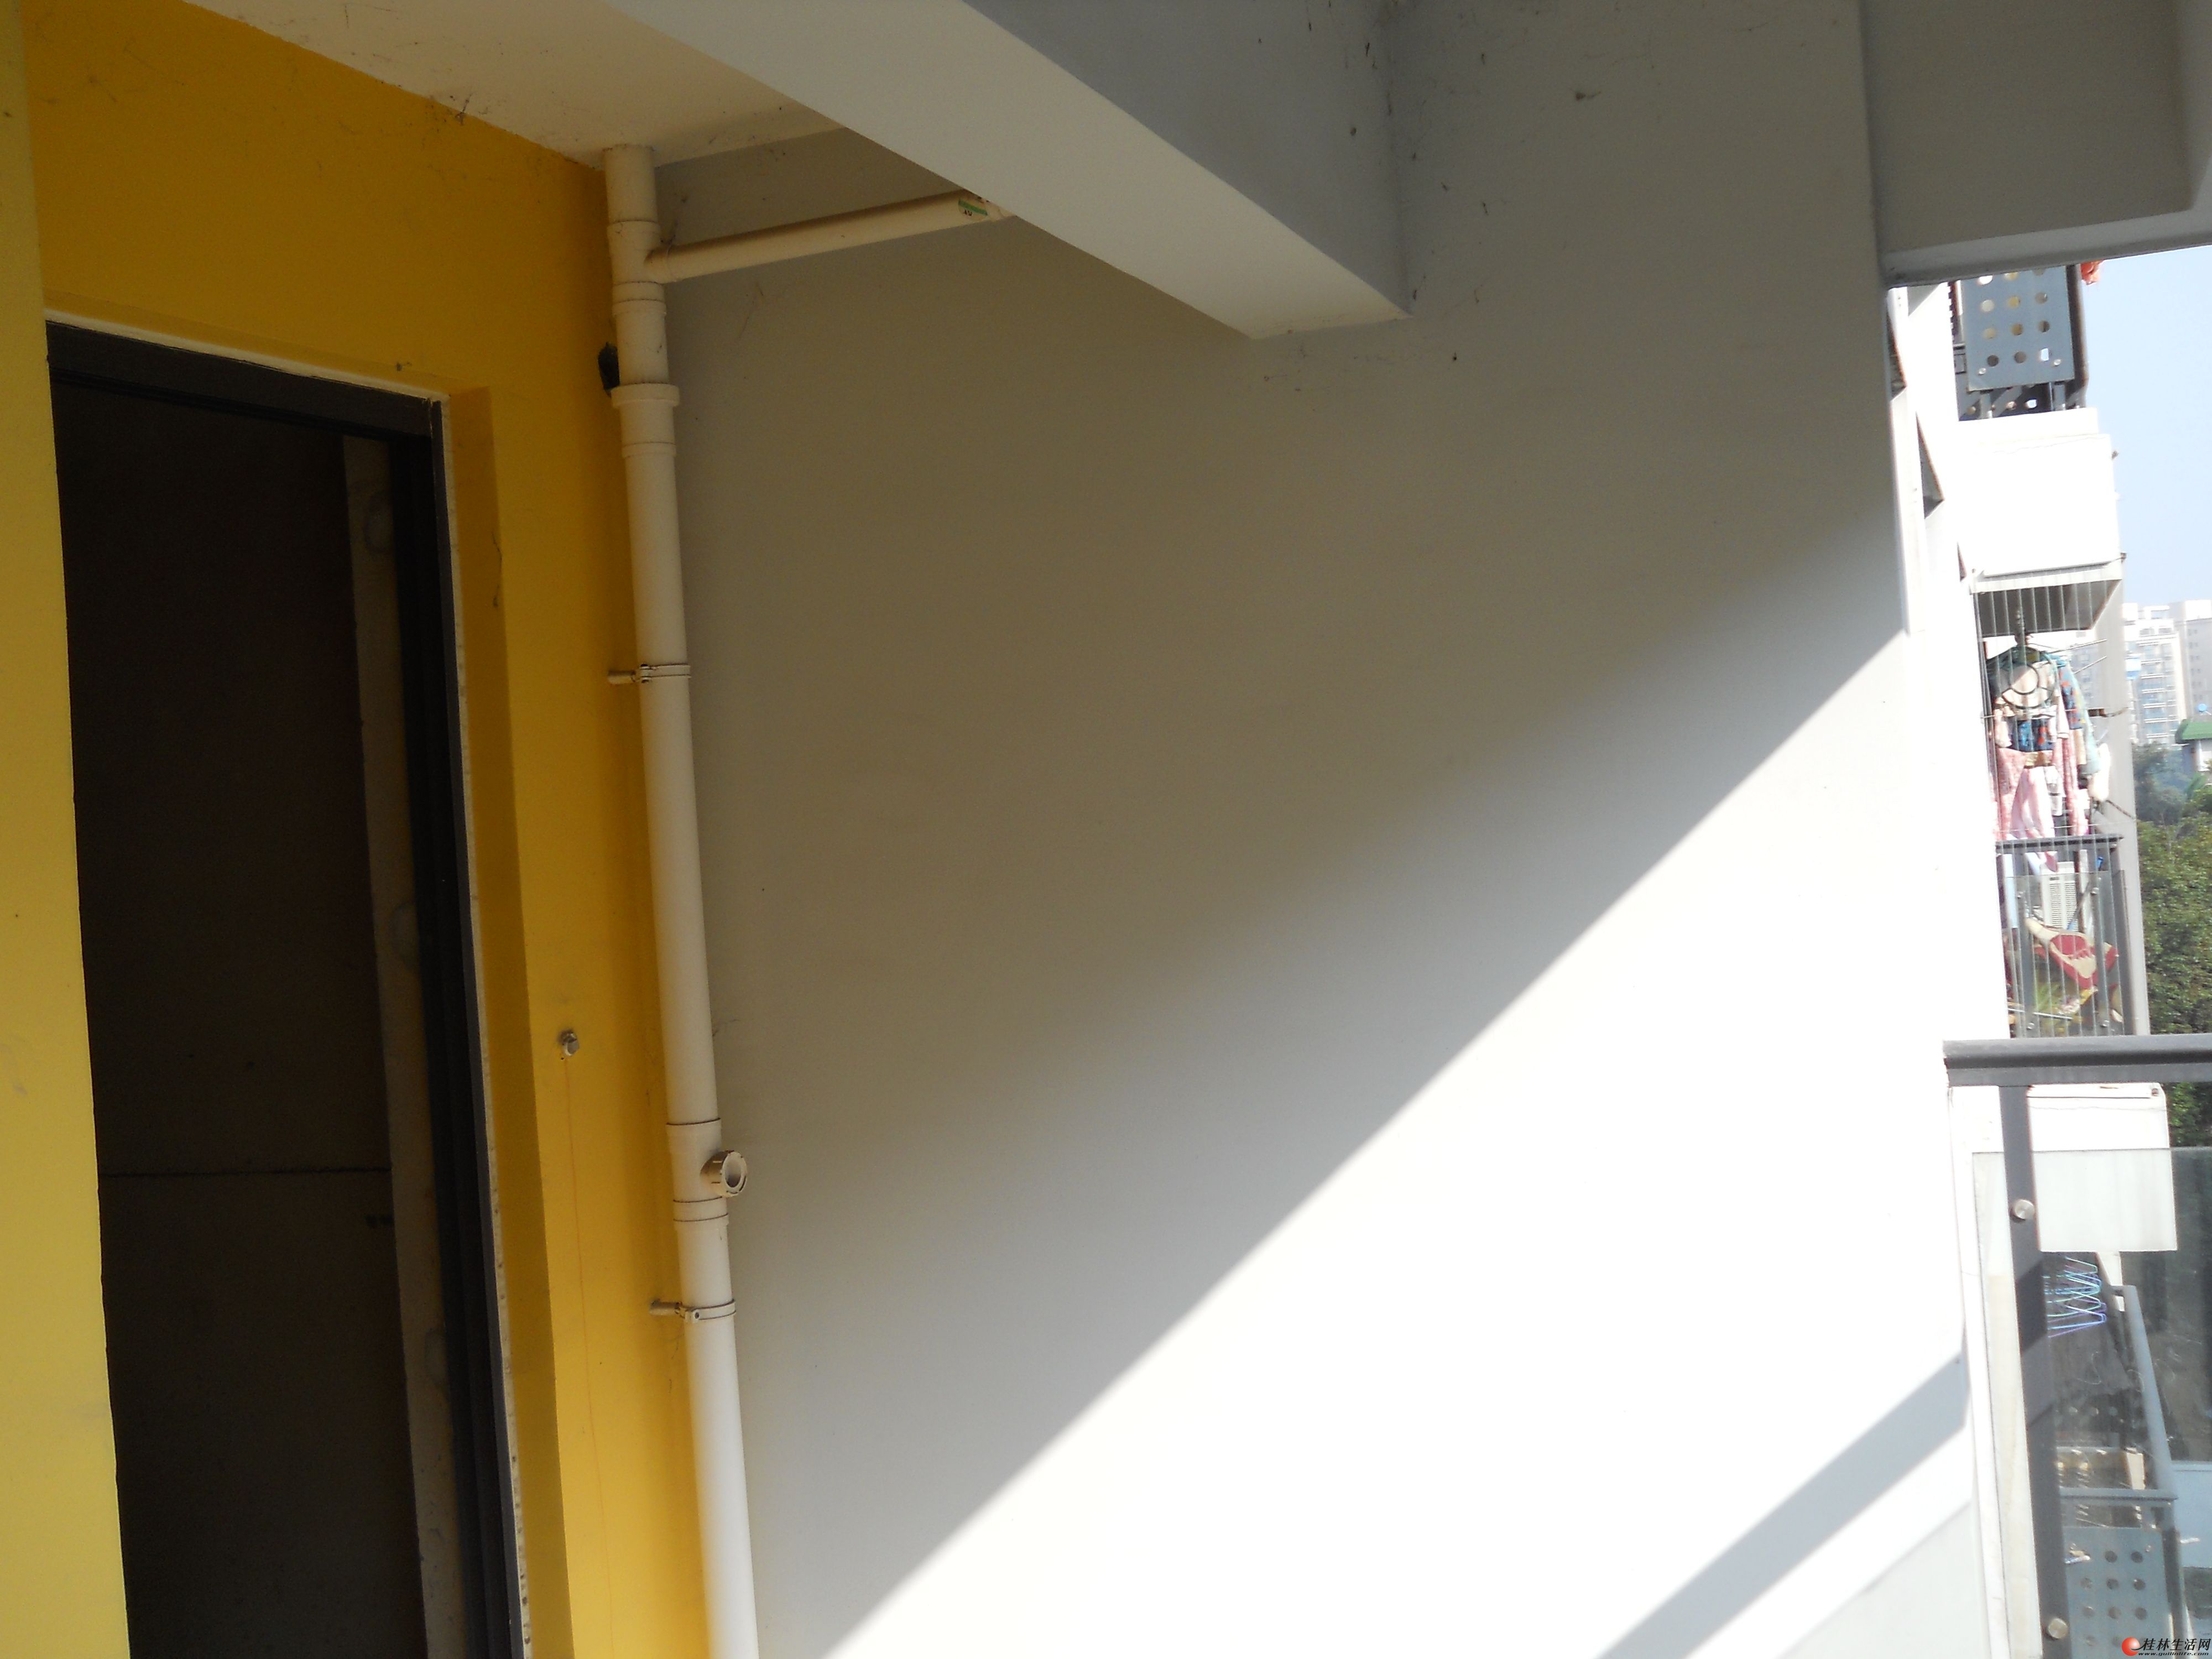 x象山区火车站边 南新铁路小区3房一厅100平方中装修家具高清图片